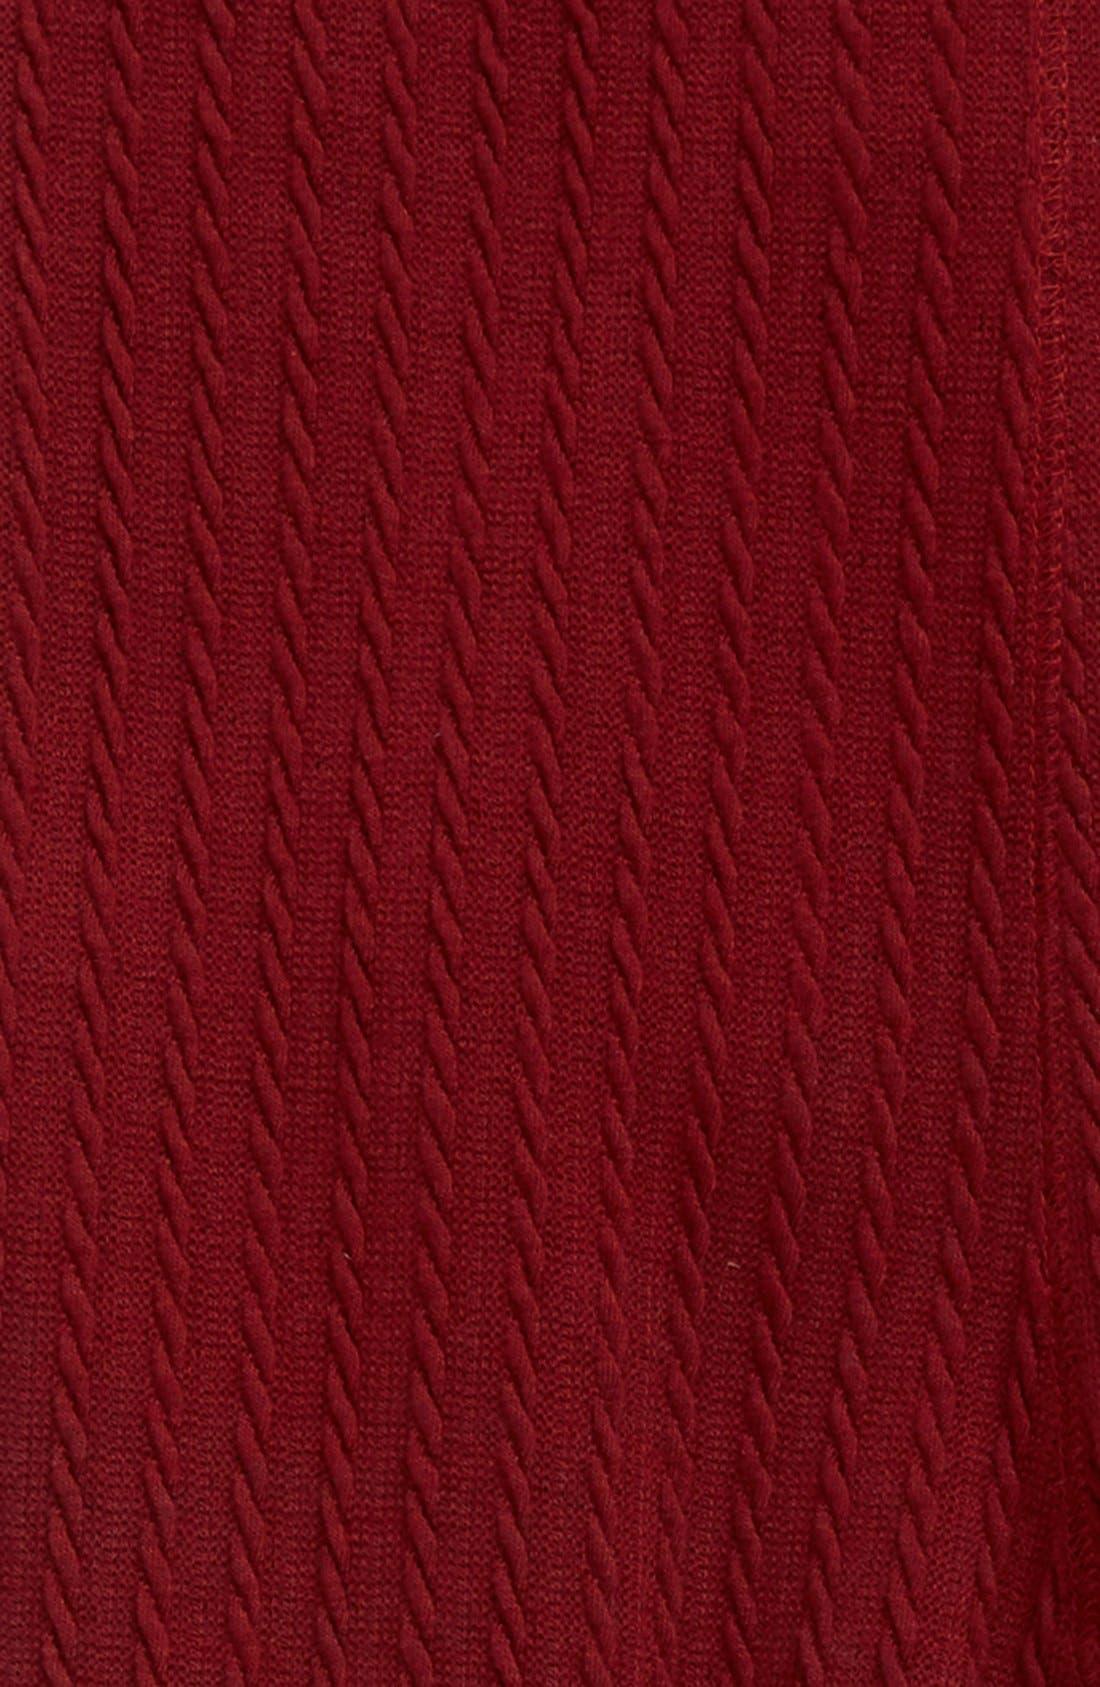 Cable Knit Leggings,                             Alternate thumbnail 11, color,